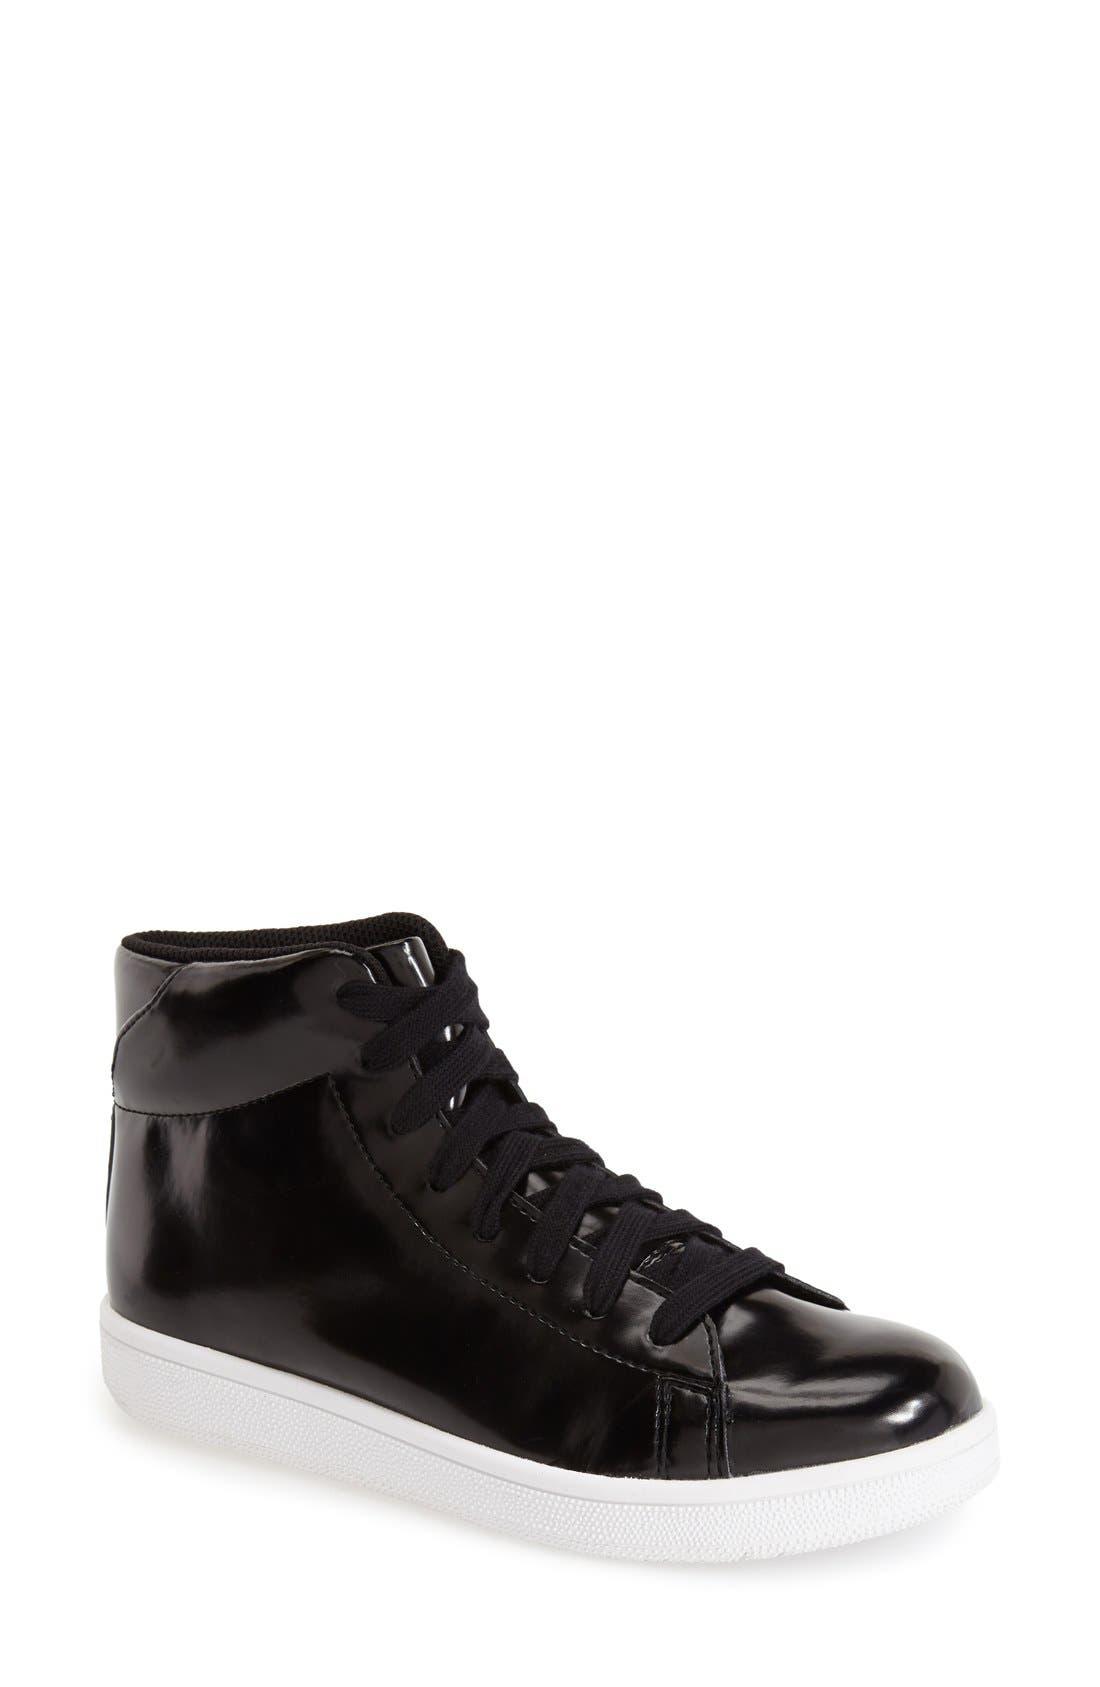 Alternate Image 1 Selected - Jeffrey Campbell 'Player' High Top Sneaker (Women)